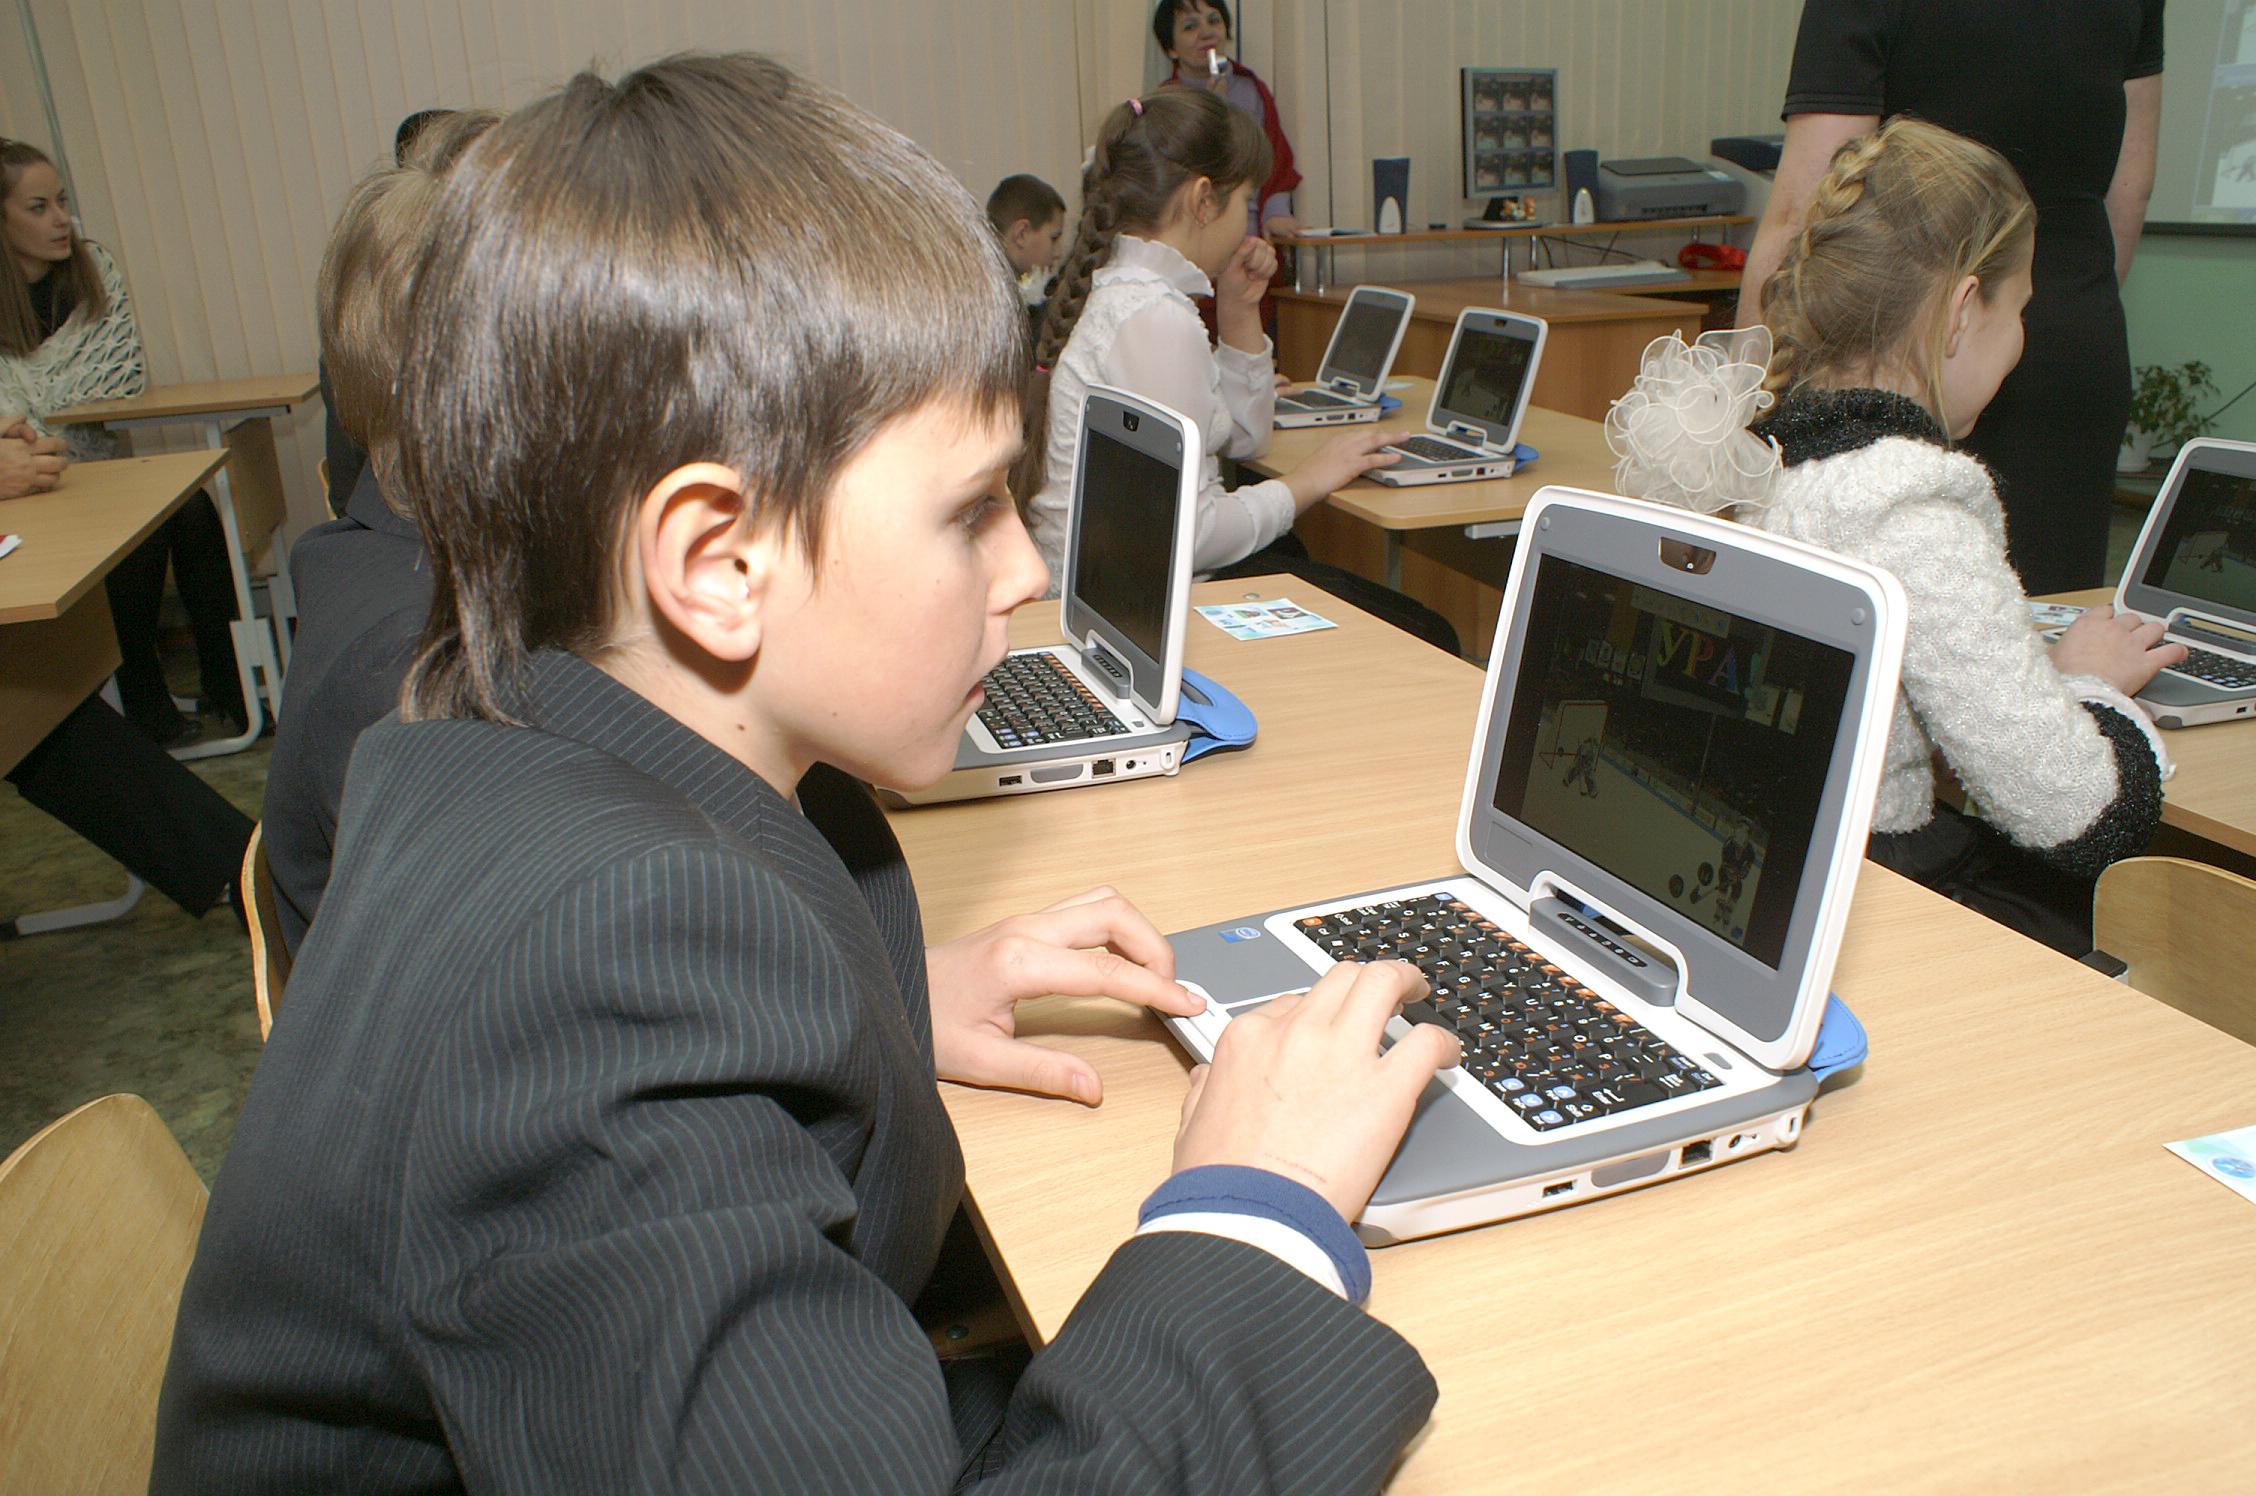 Картинки и фото детей за компьютером